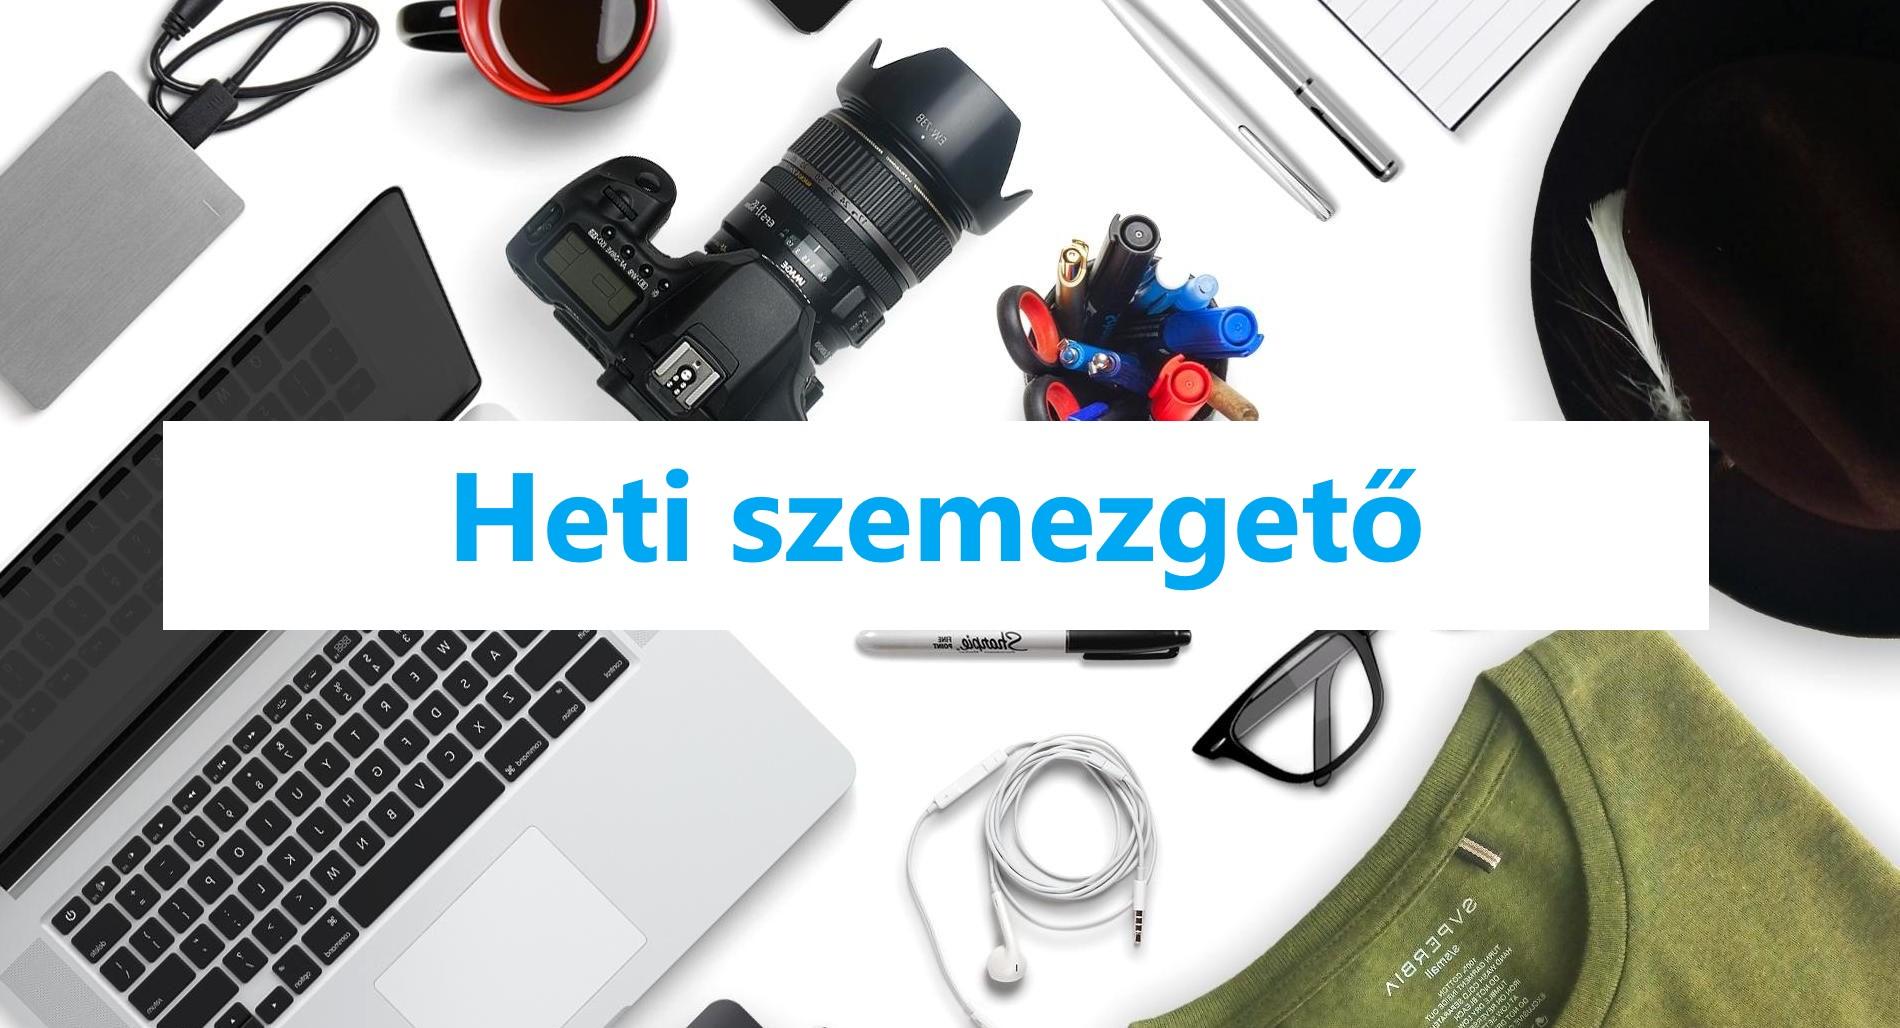 heti_szemezgeto_uj_65.jpg